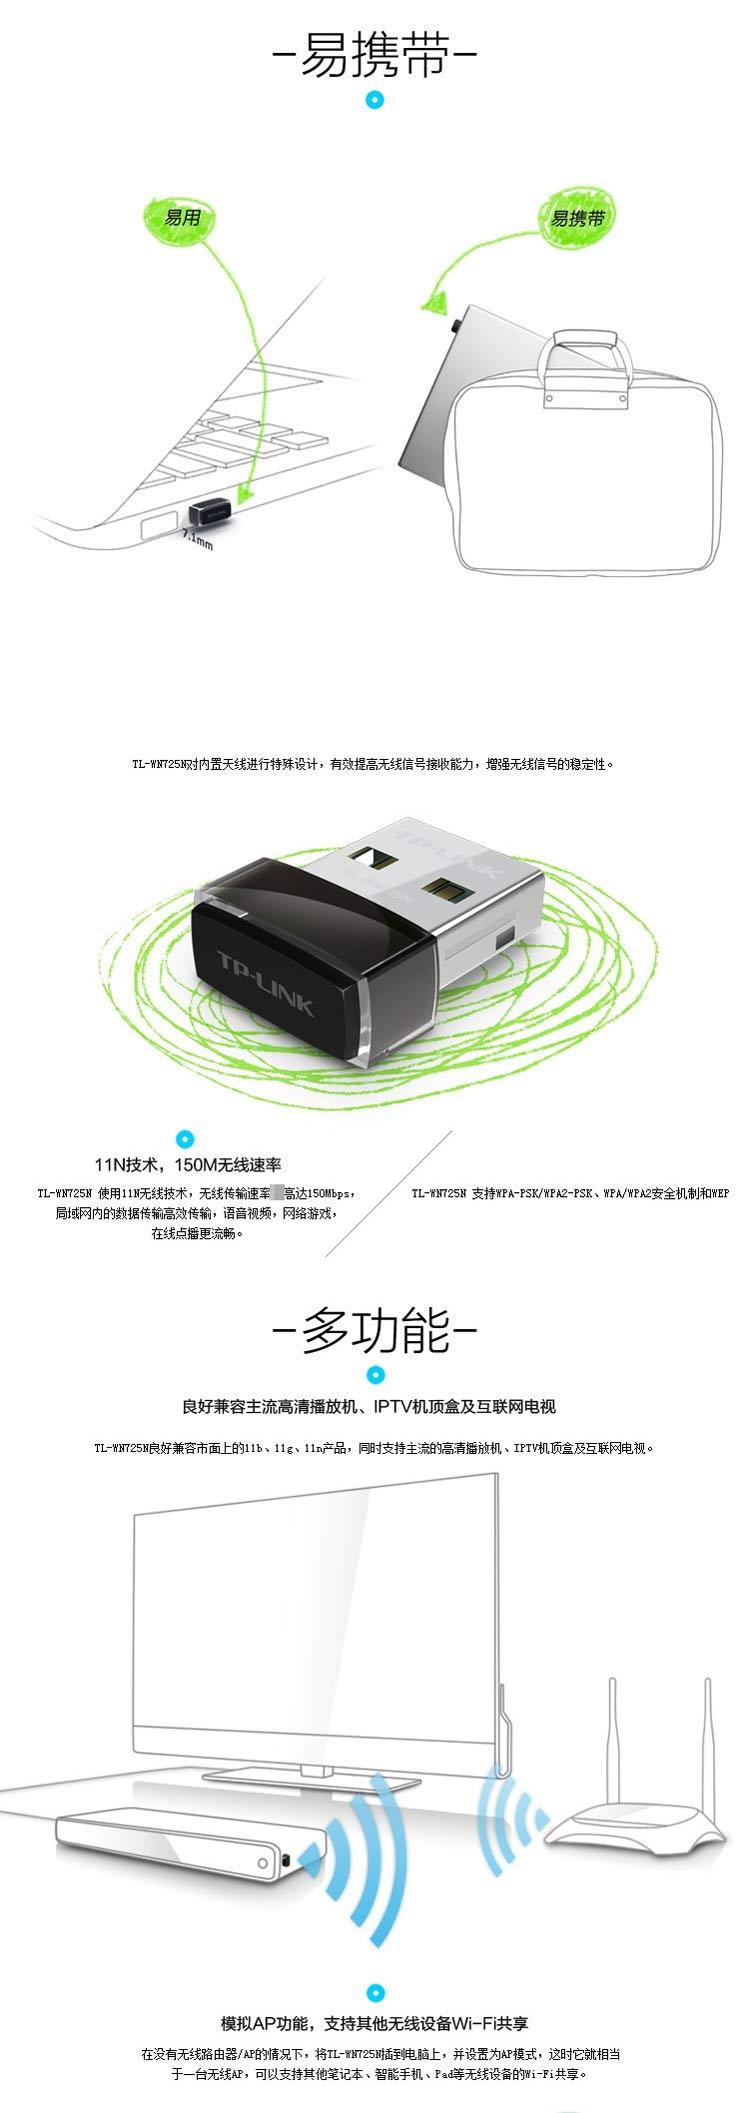 TP-LINK TL-WN823N网卡05